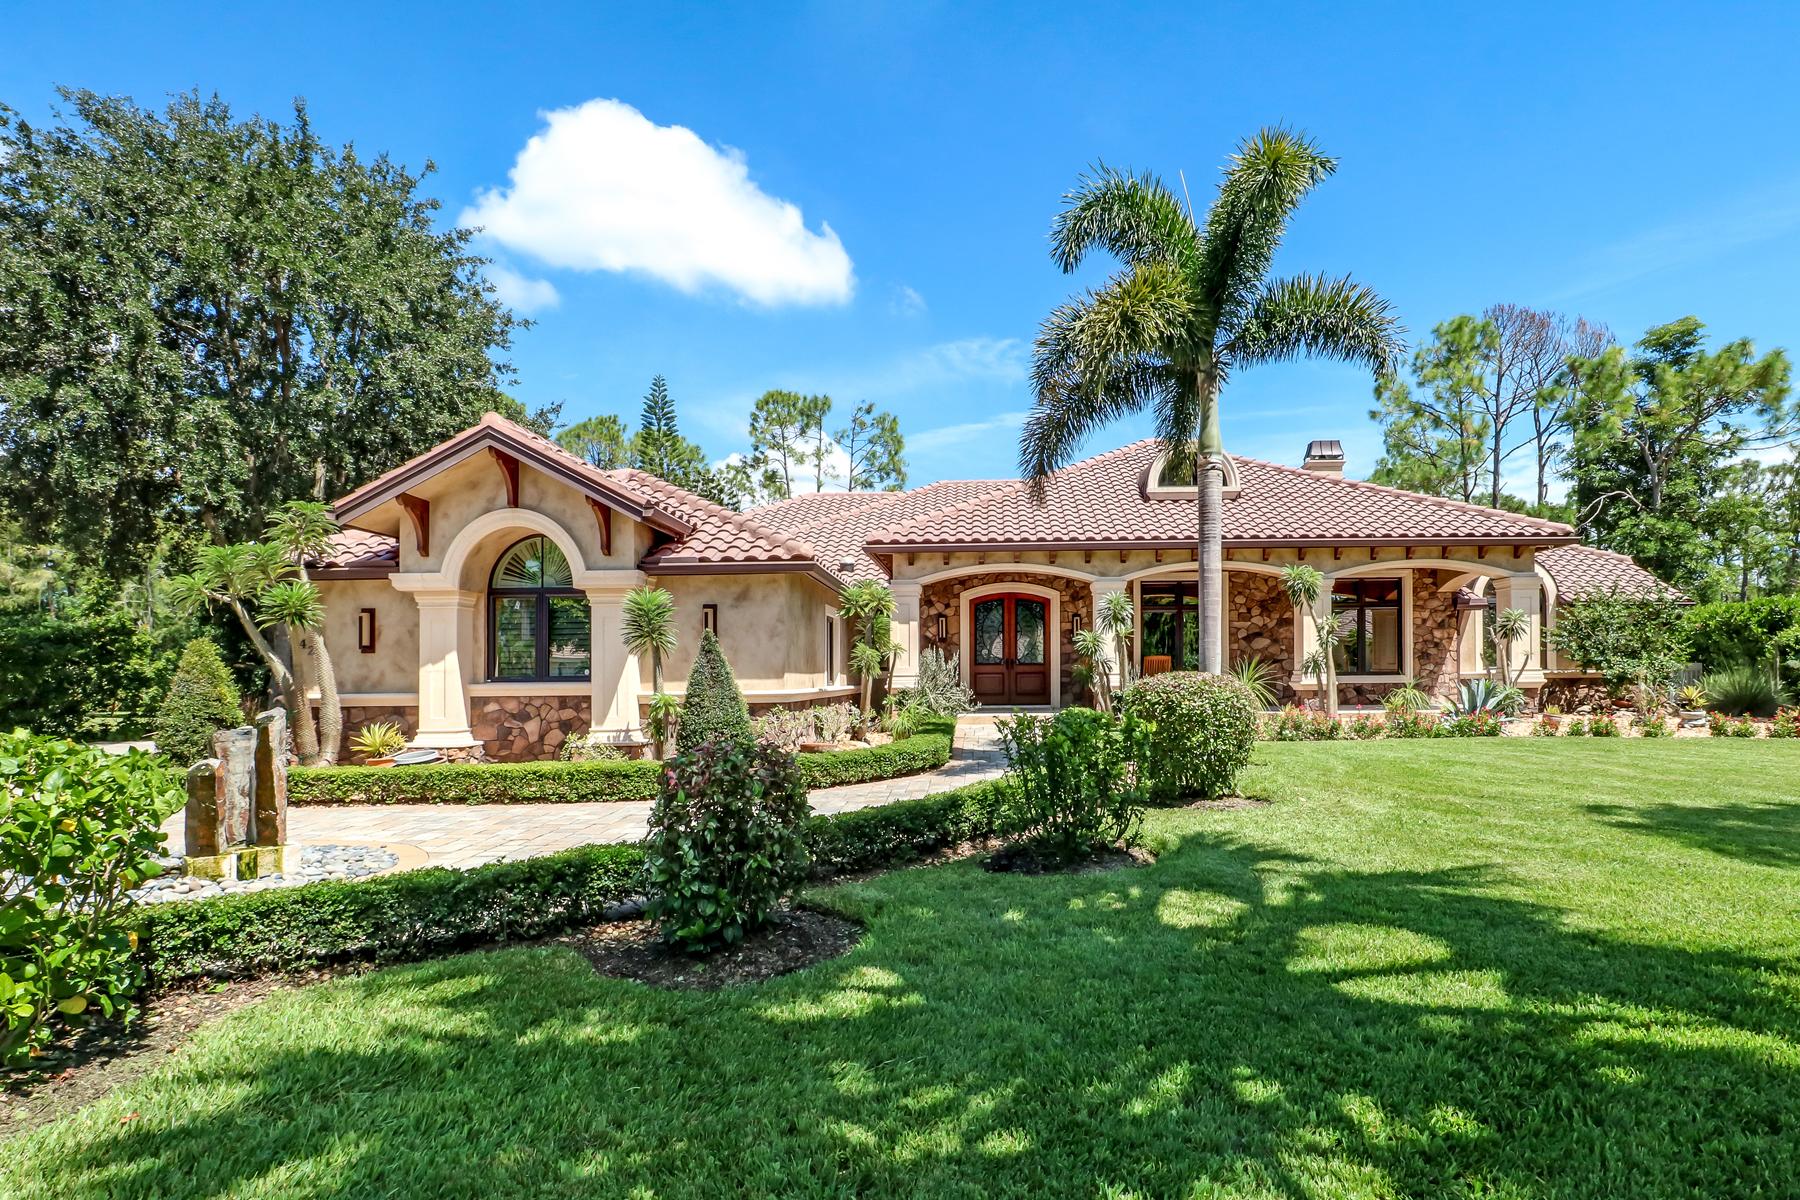 FLORIDA WEEKLY HOUSE HUNTING